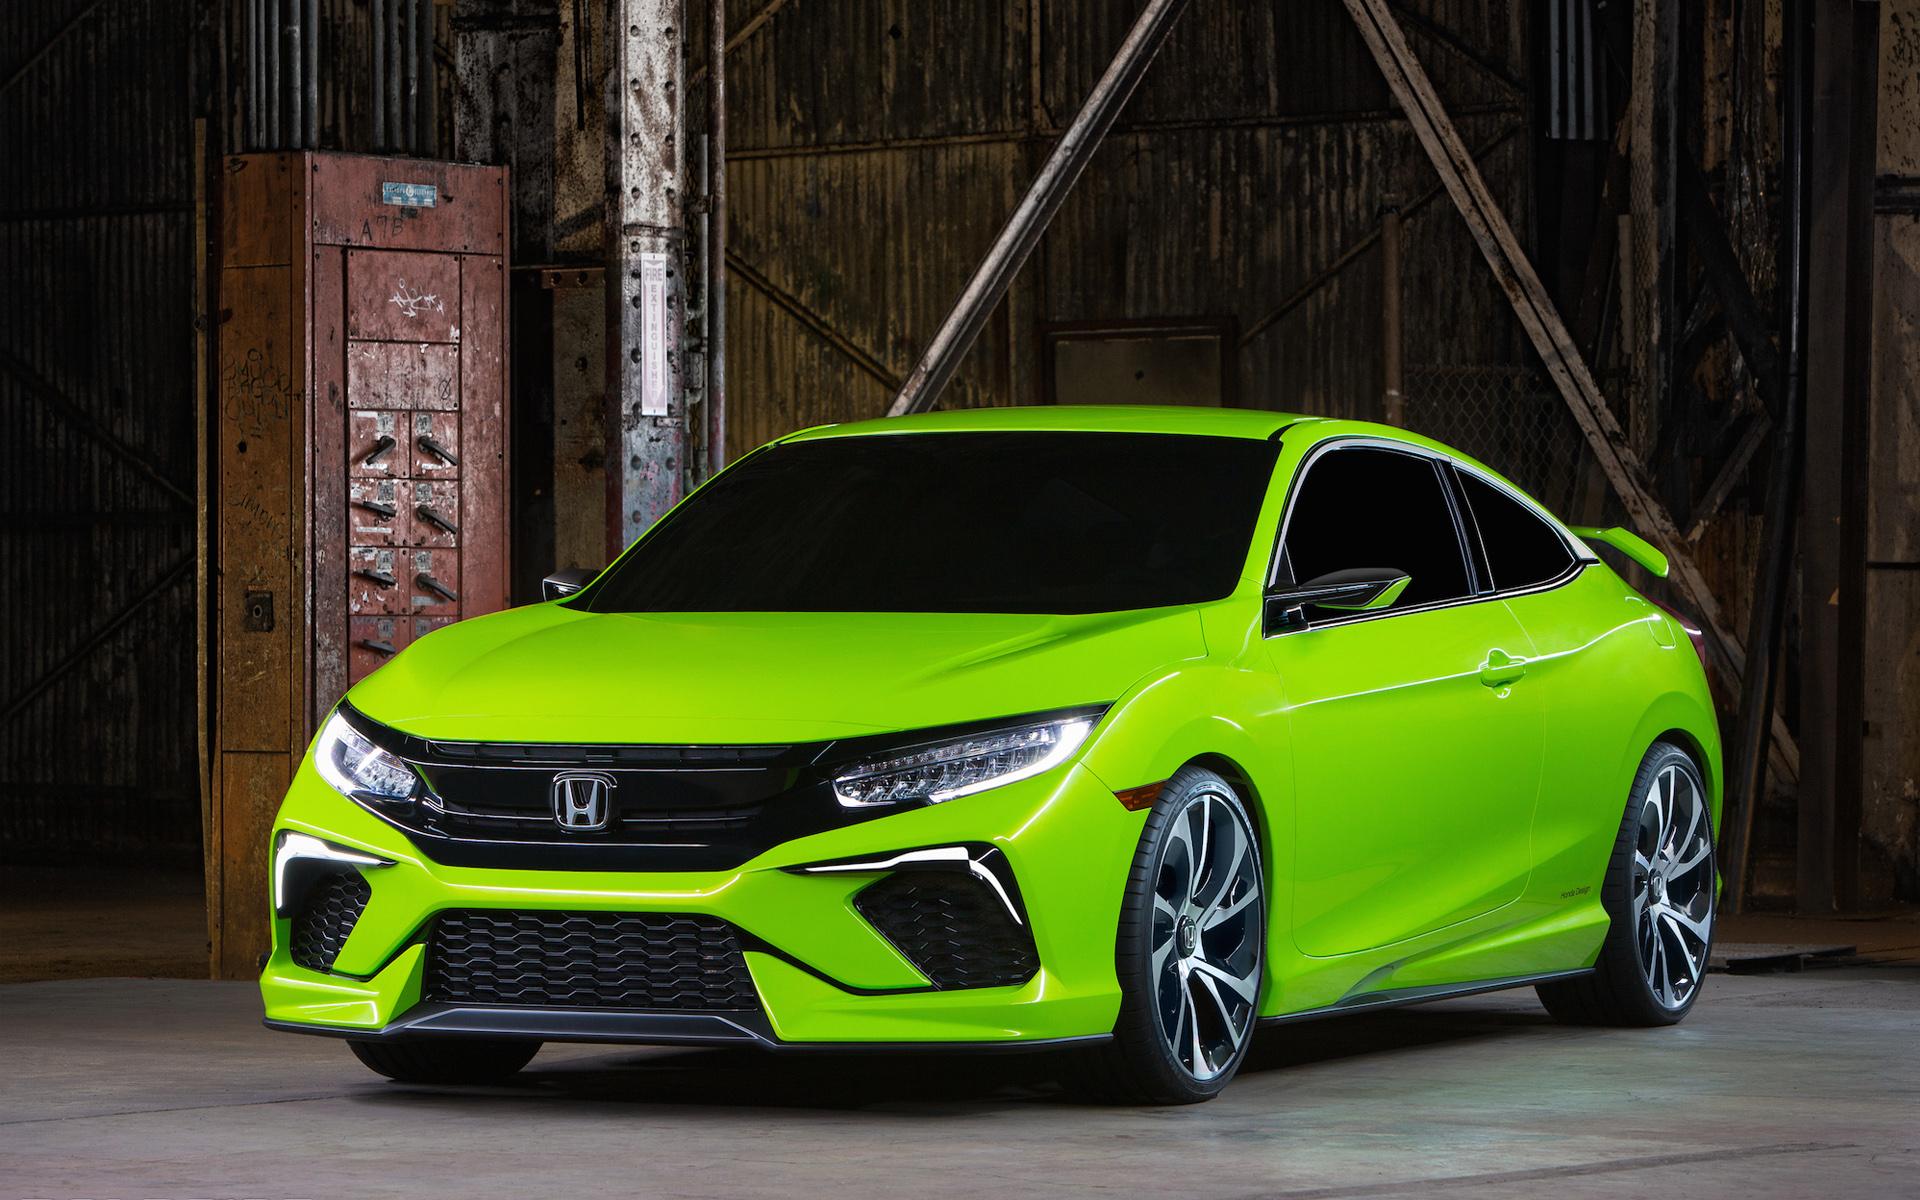 HD Honda Backgrounds & Honda Wallpaper Images For Download